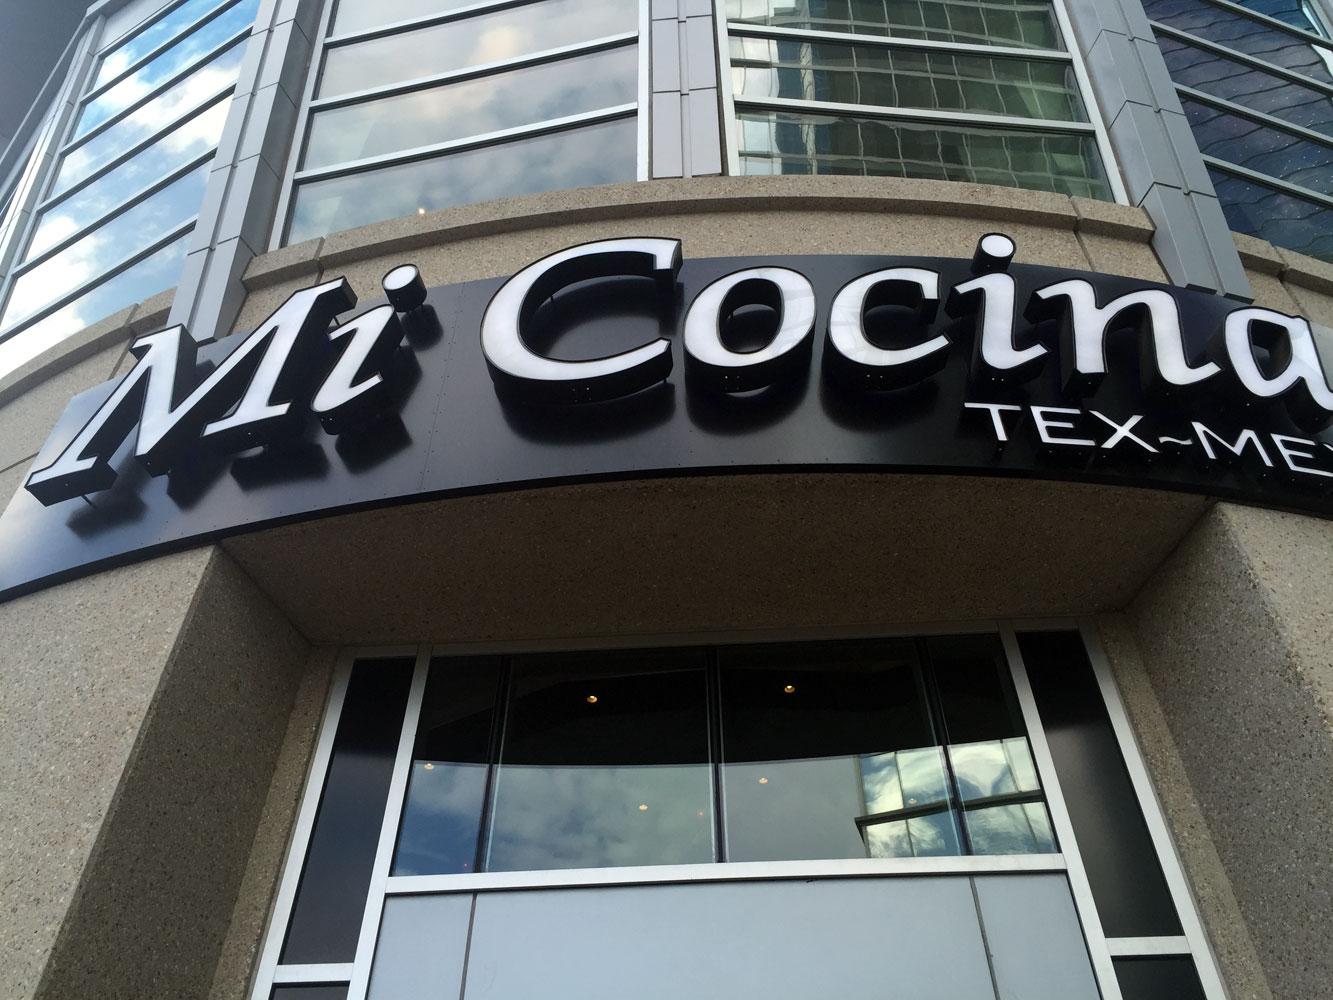 Independent Restaurant Review: Mi Cocina Tex-Mex - Midtown Atlanta ...